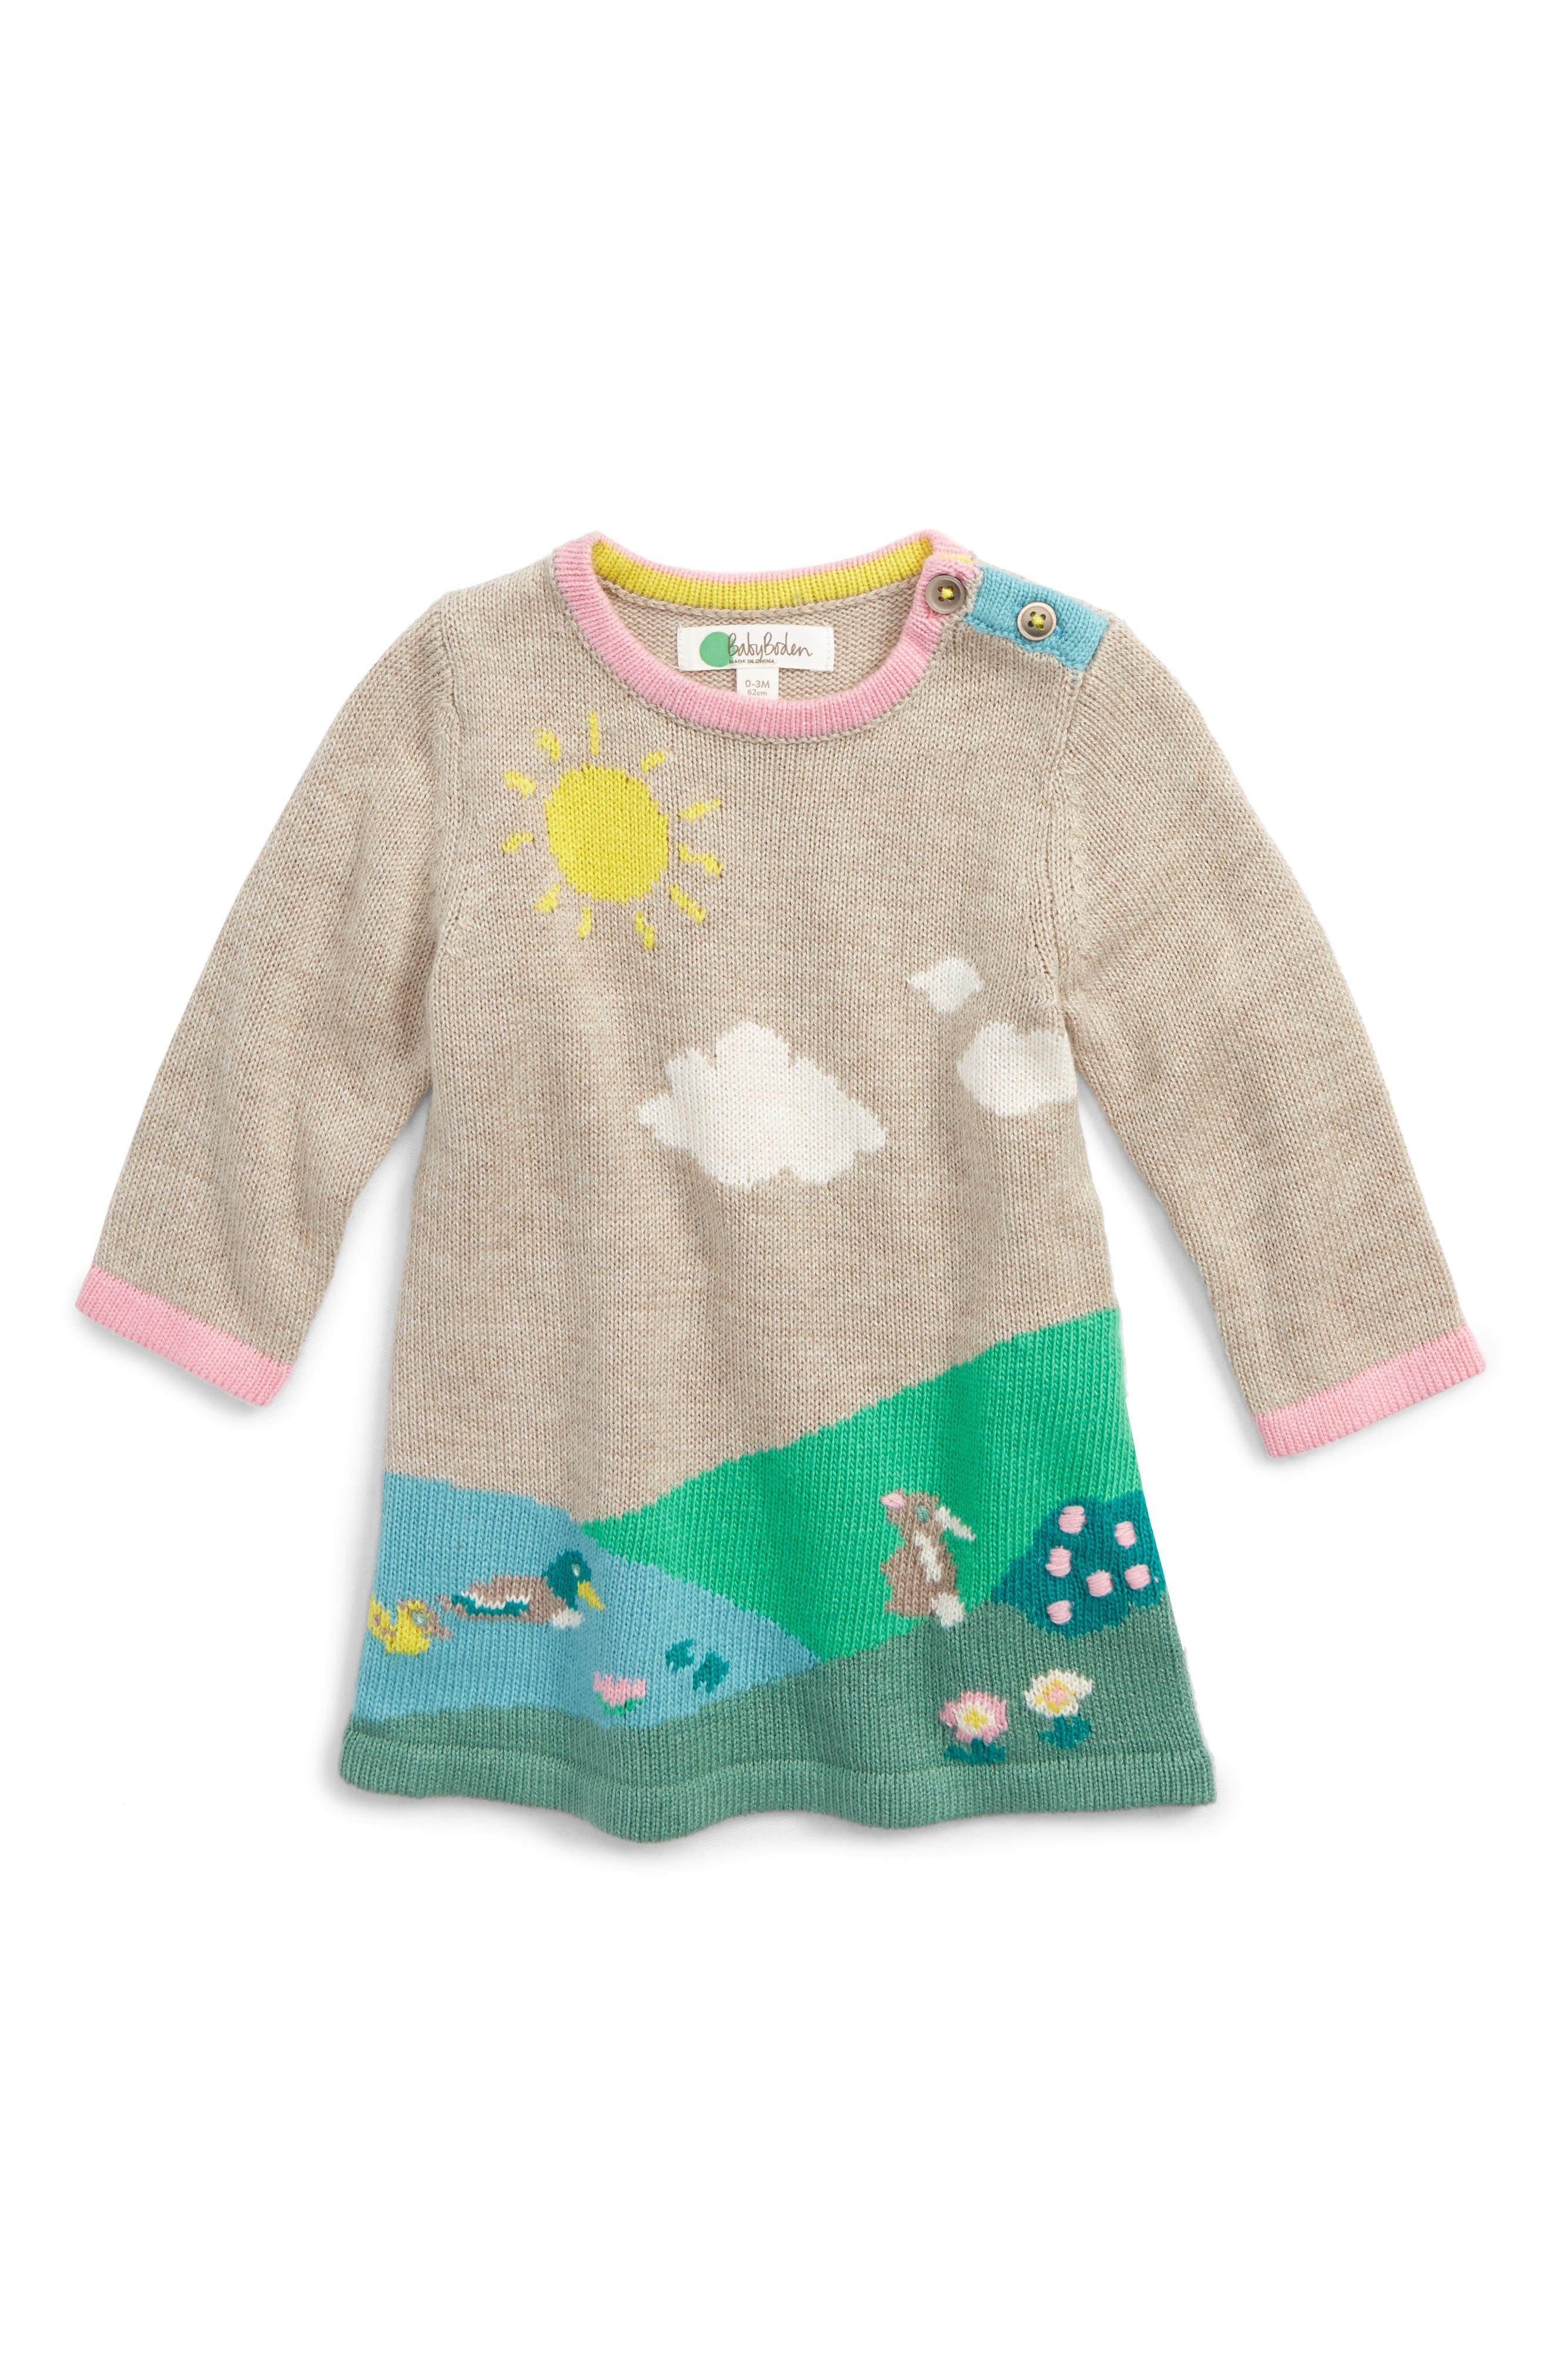 Alternate Image 1 Selected - Mini Boden River Bank Intarsia Knit Dress (Baby Girls & Toddler Girls)